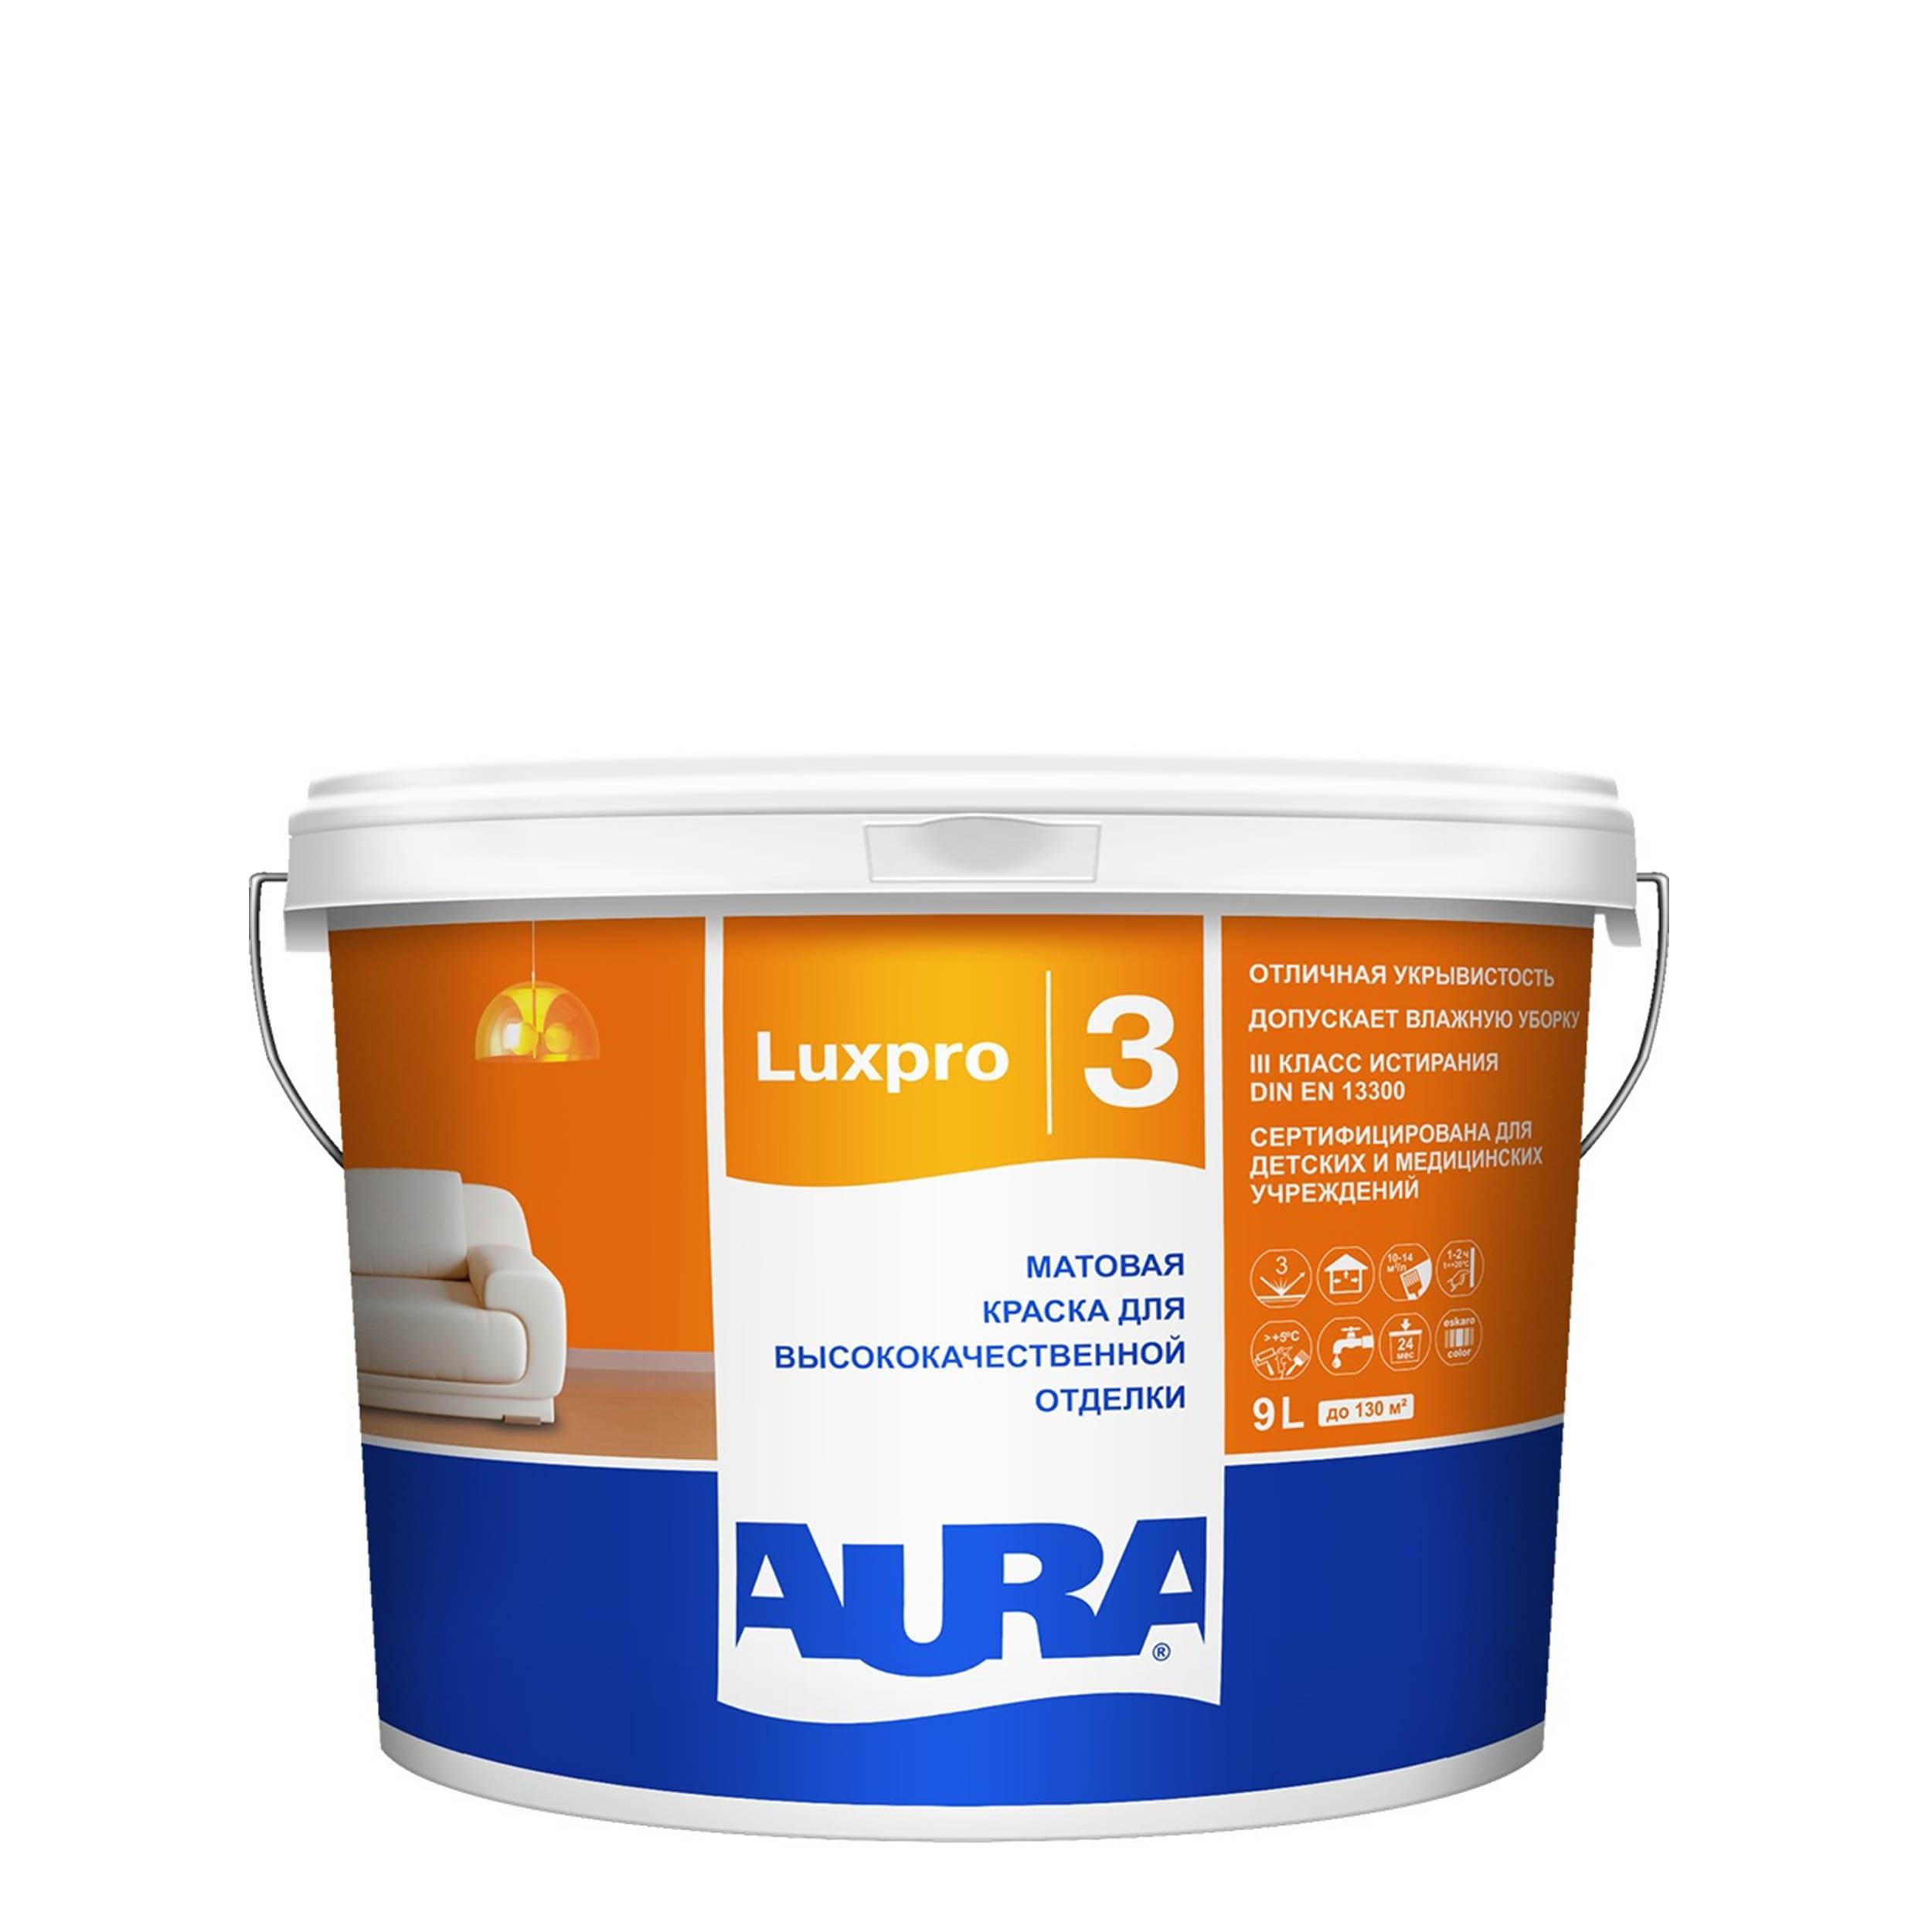 Фото 3 - Краска интерьерная, Aura LuxPRO 3, RAL 6004, 11 кг.